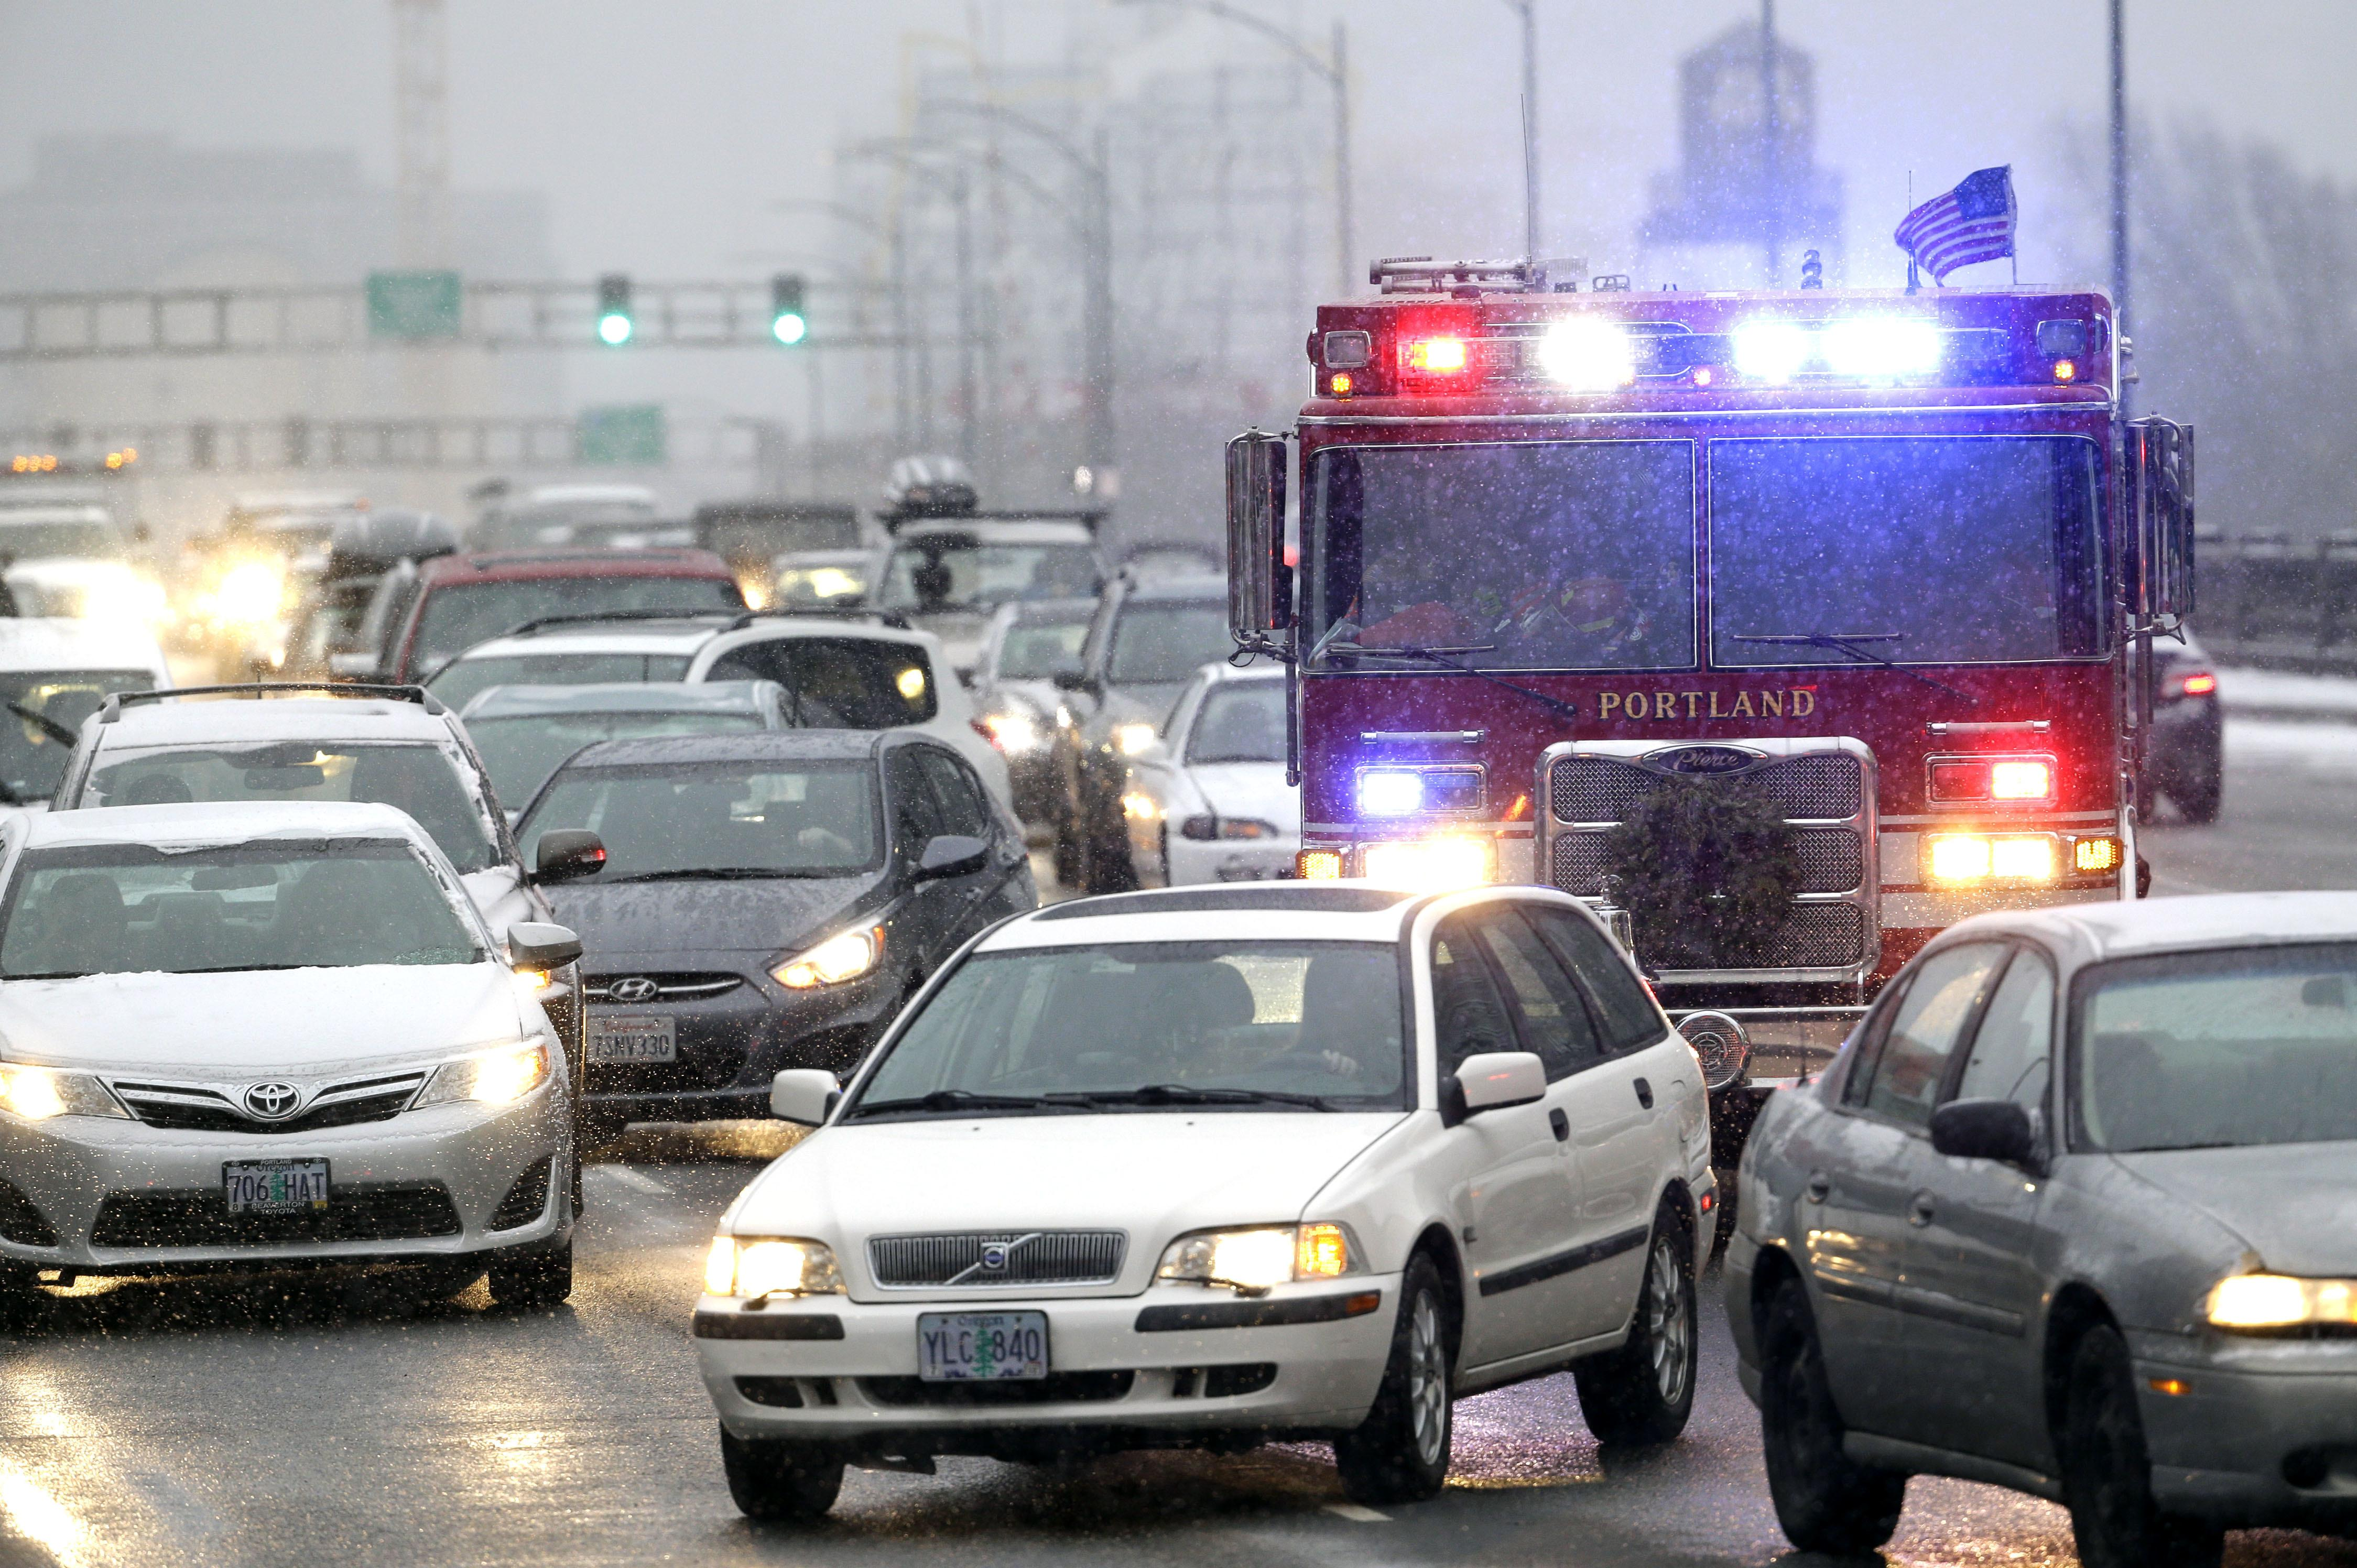 Winter storm brings Portland to a halt | The Spokesman-Review